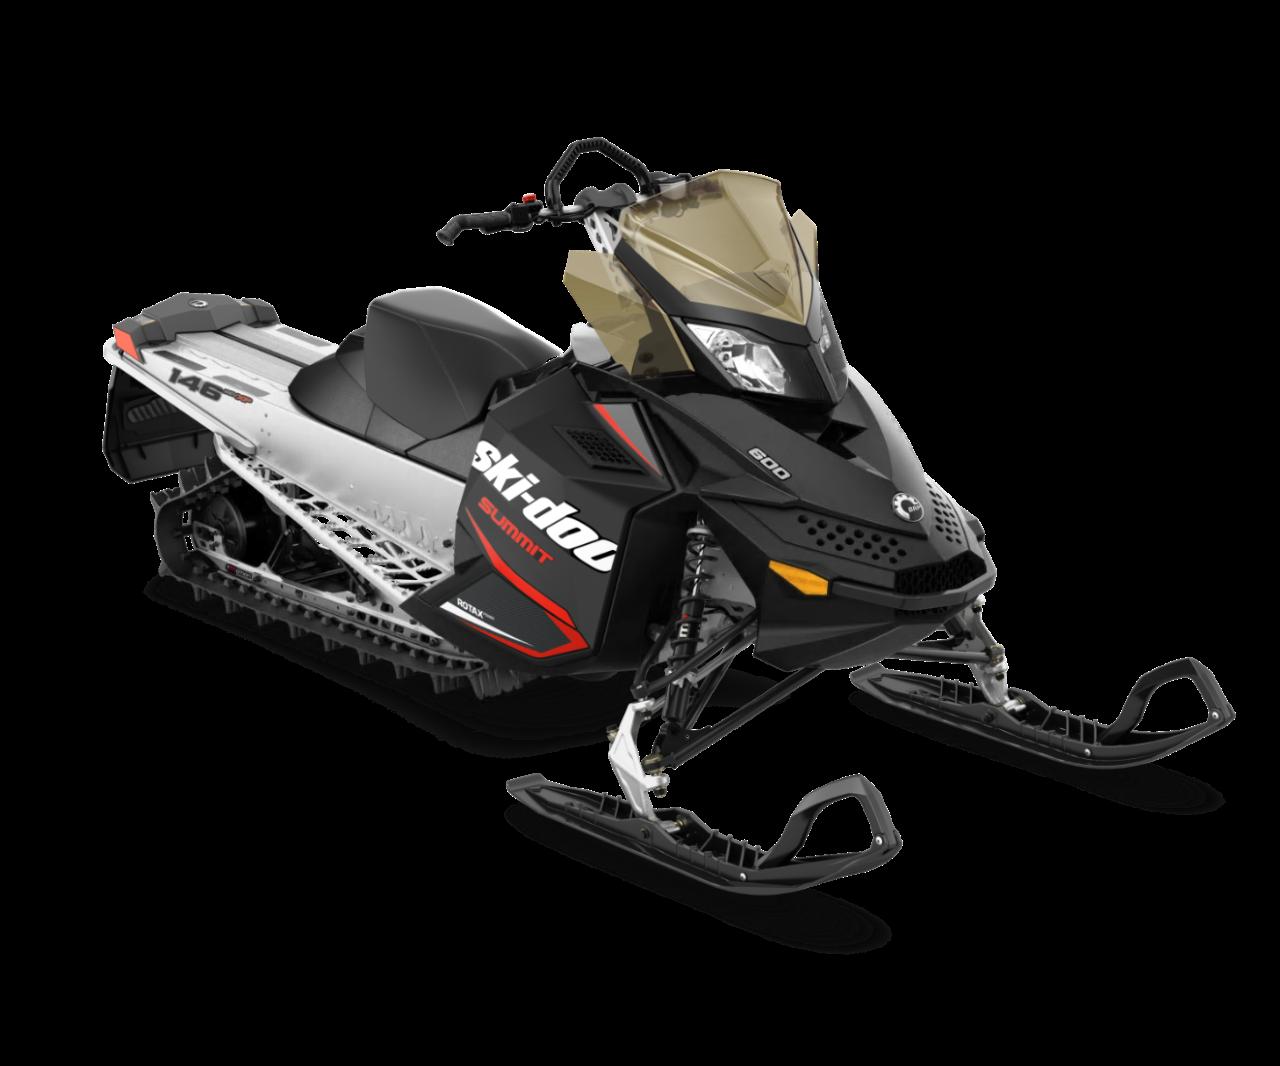 Muskoka Rentals - Snowmobile Daily Rental - 1 Rider per Machine